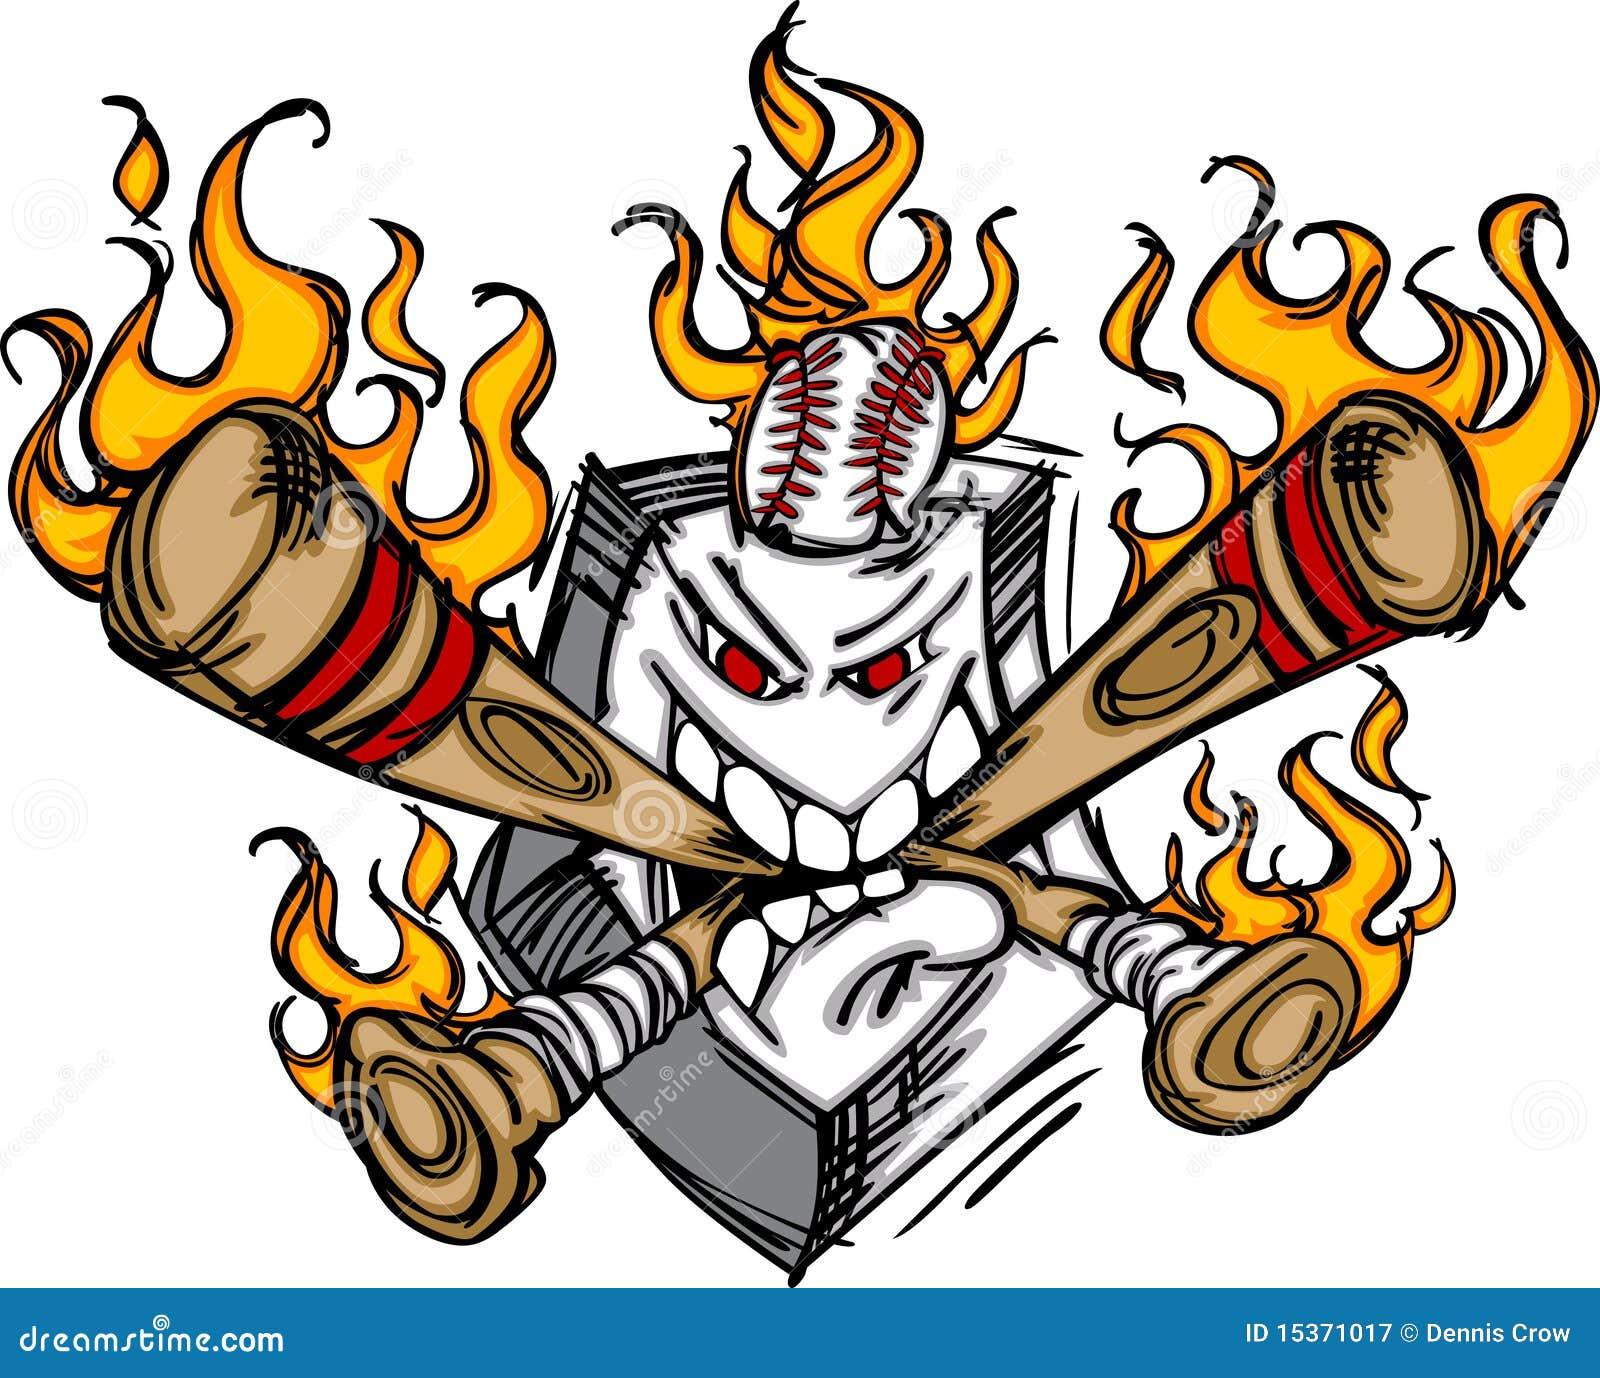 softball baseball plate flaming cartoon logo stock vector rh dreamstime com